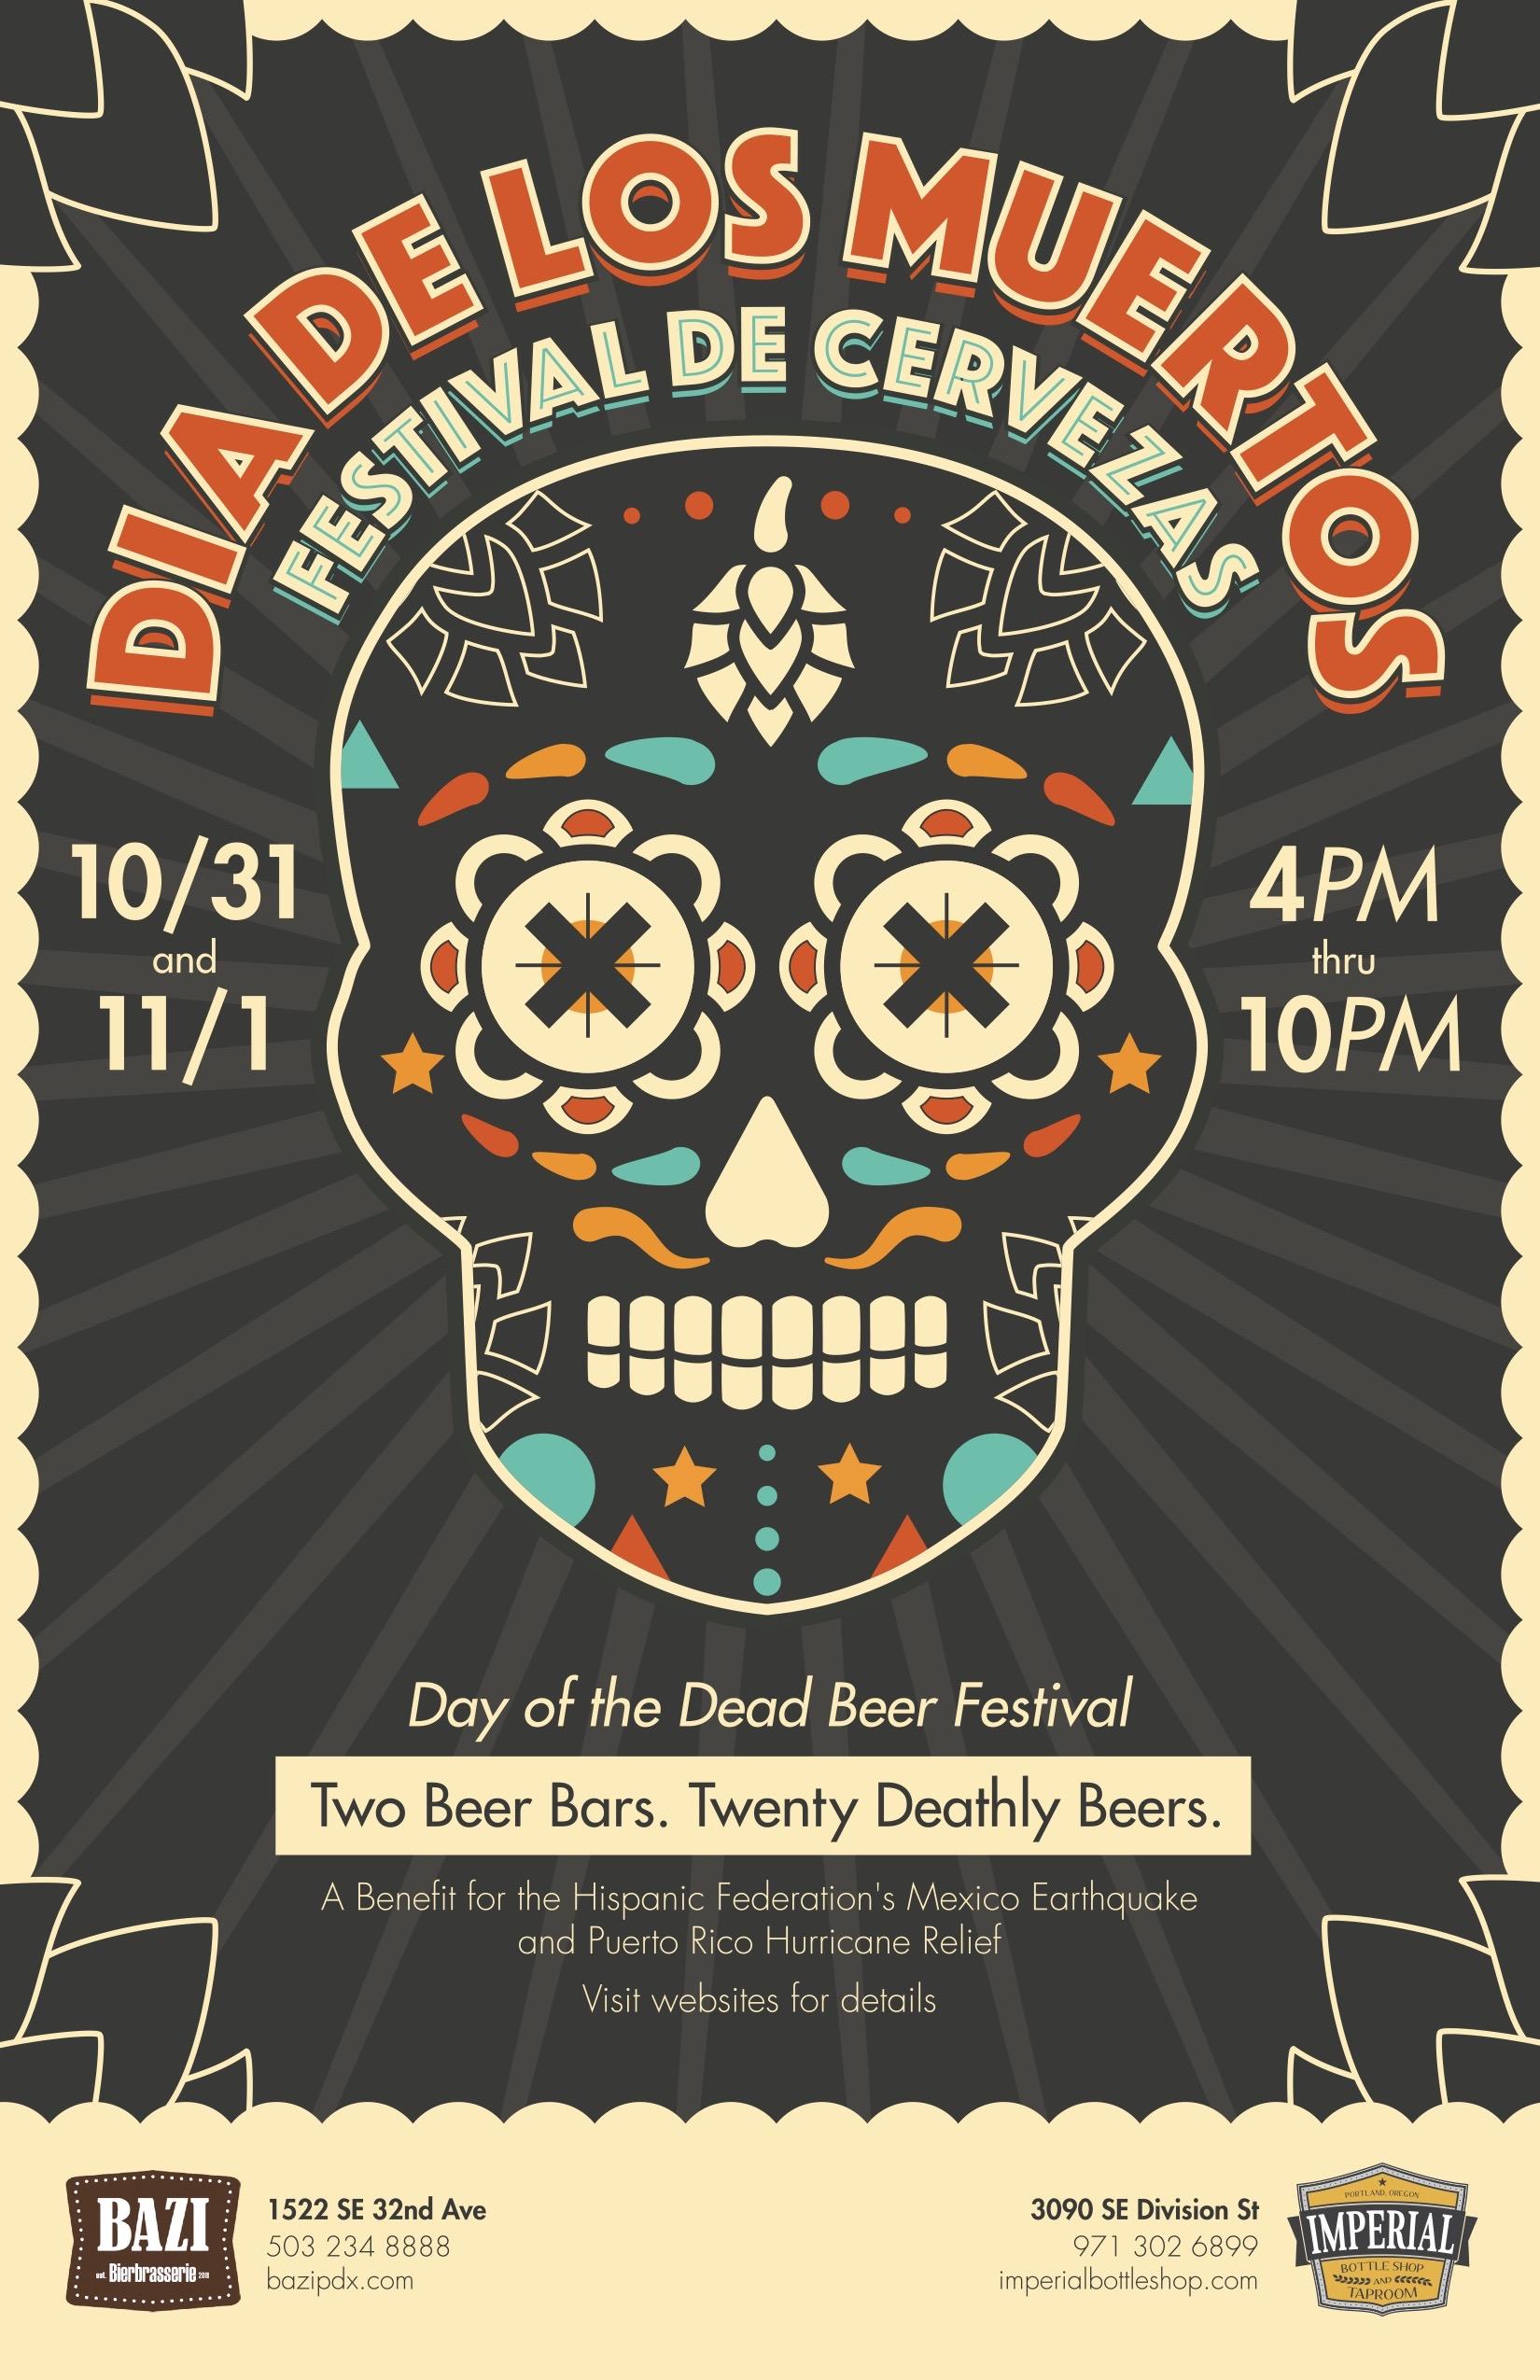 Bazi Bierbrasserie & Imperial Bottle Shop Presents the 2017 Día De Los Muertos Festival De Cervezas – All Souls Day Beer Festival